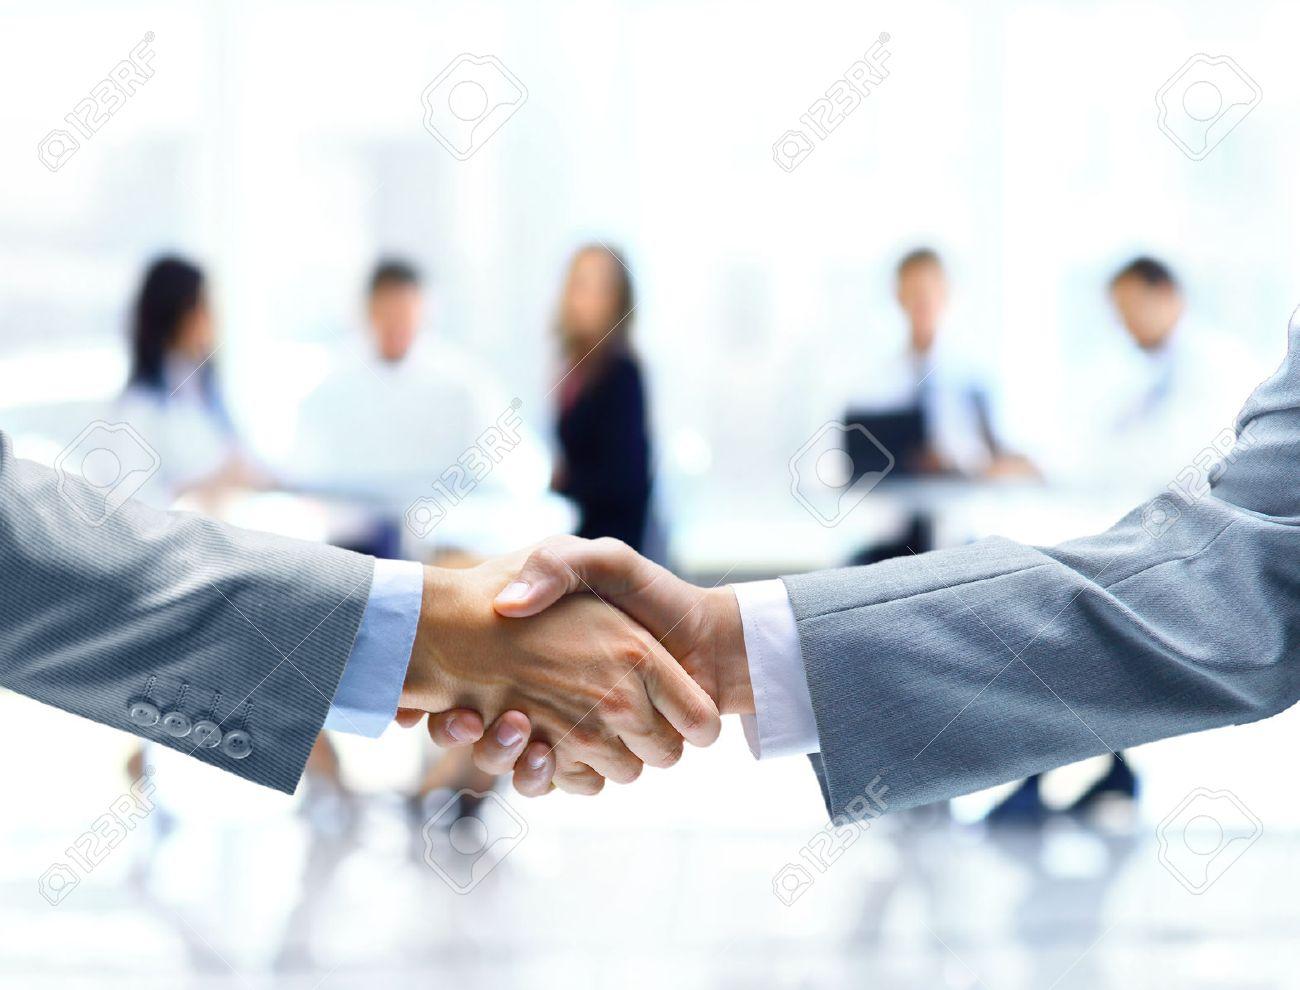 Close up of businessmen shaking hands Standard-Bild - 29170010